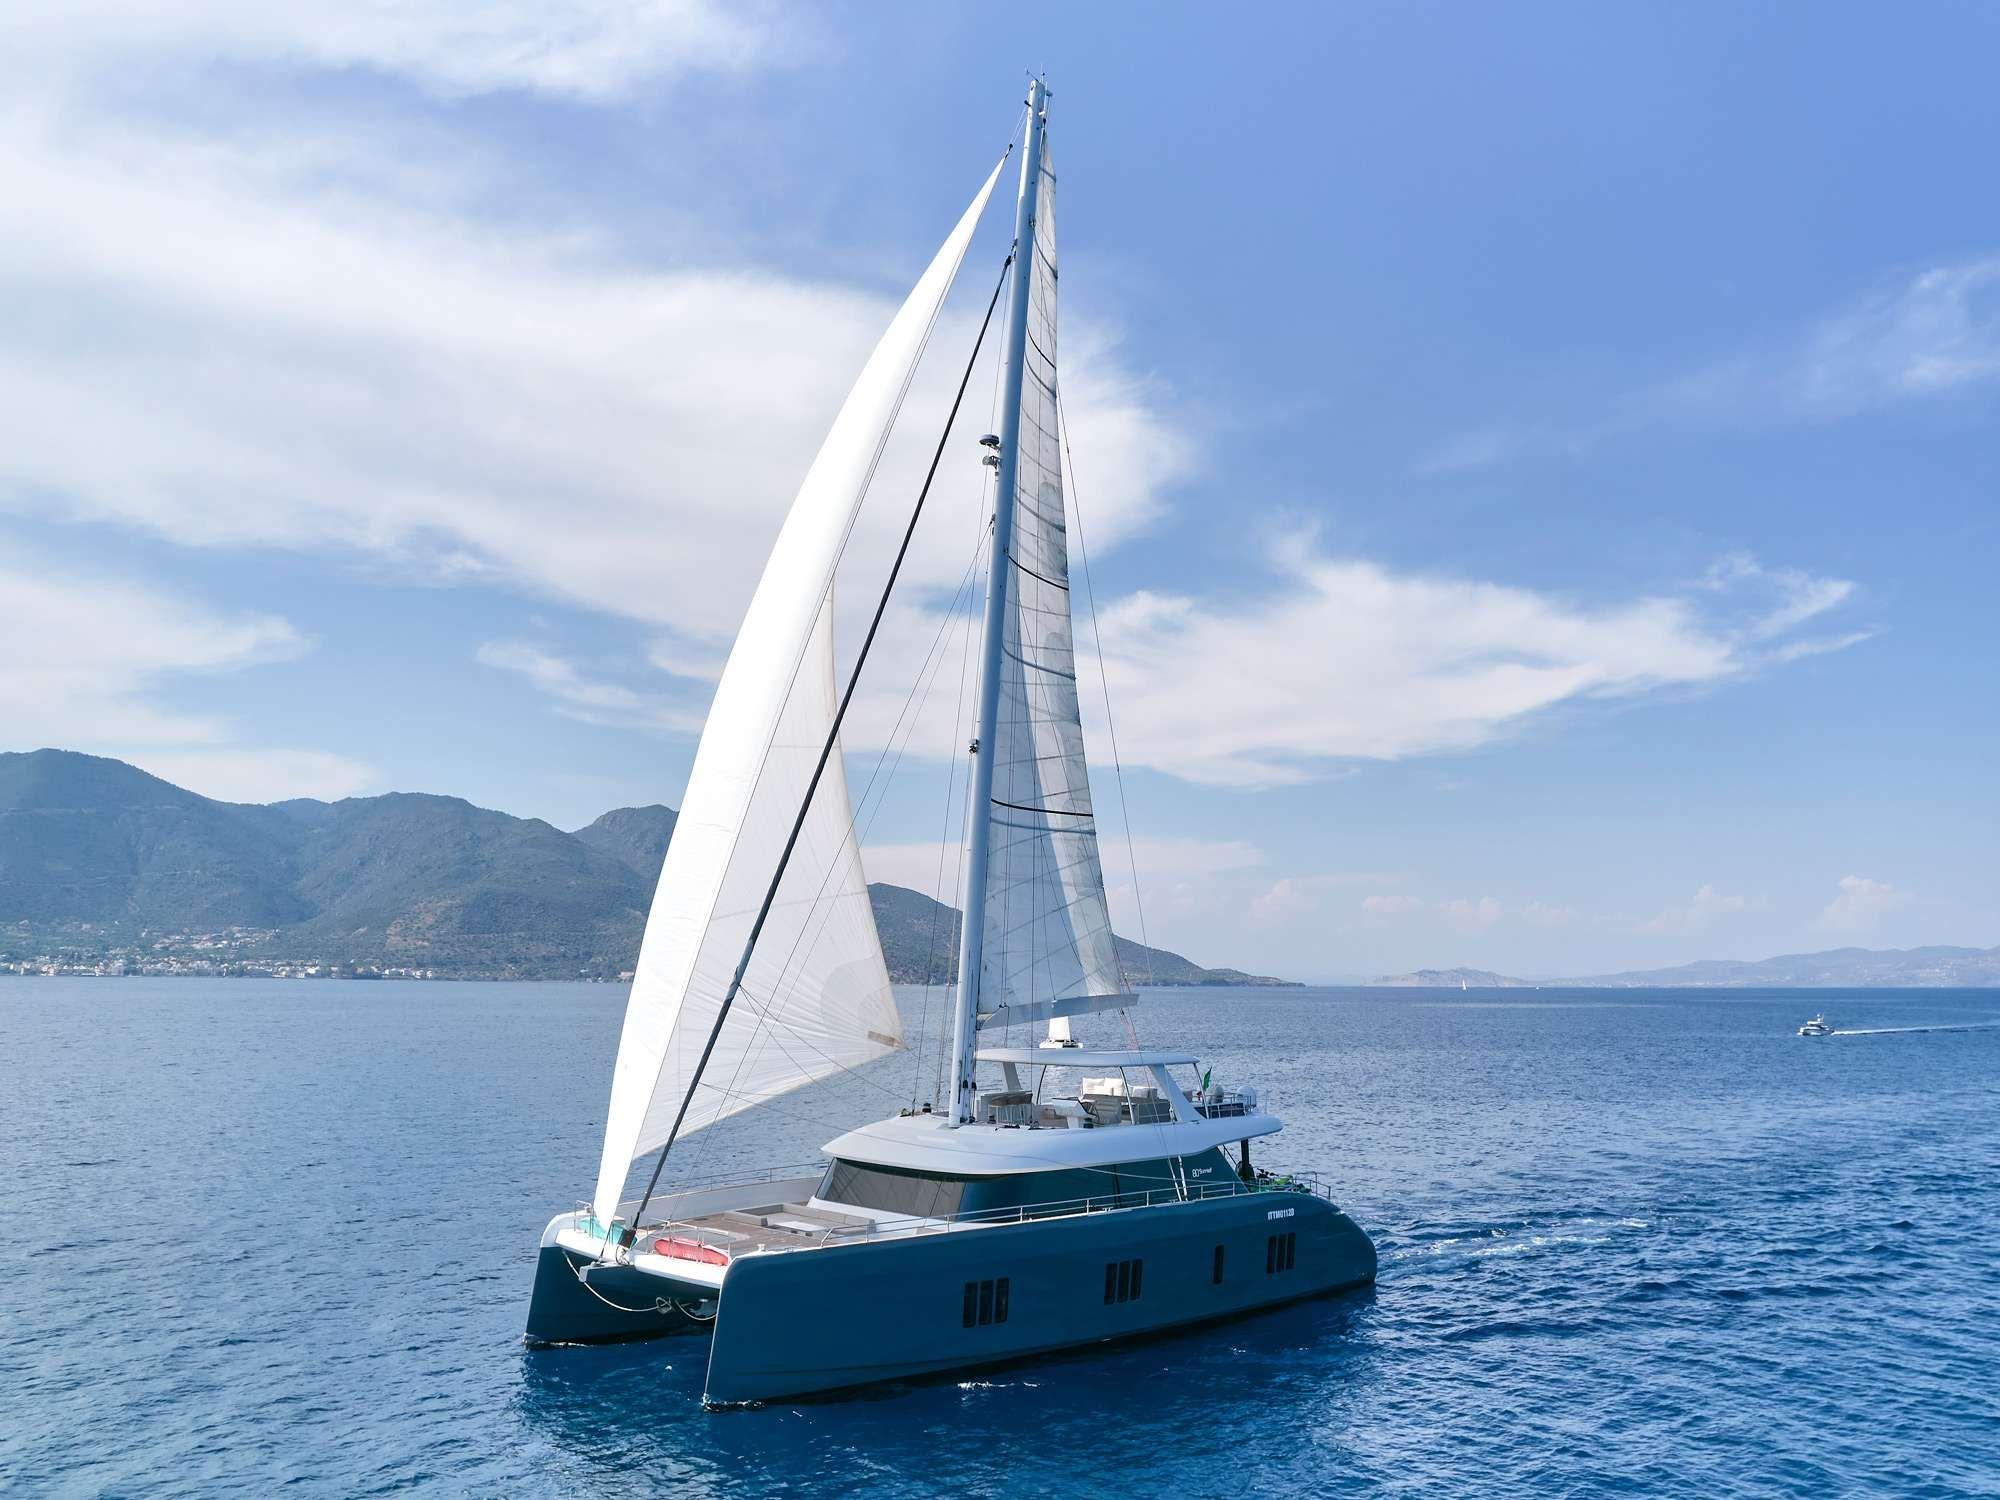 GENNY - Sunreef 80 - 5 Cabins - Athens - Mykonos - Zakynthos